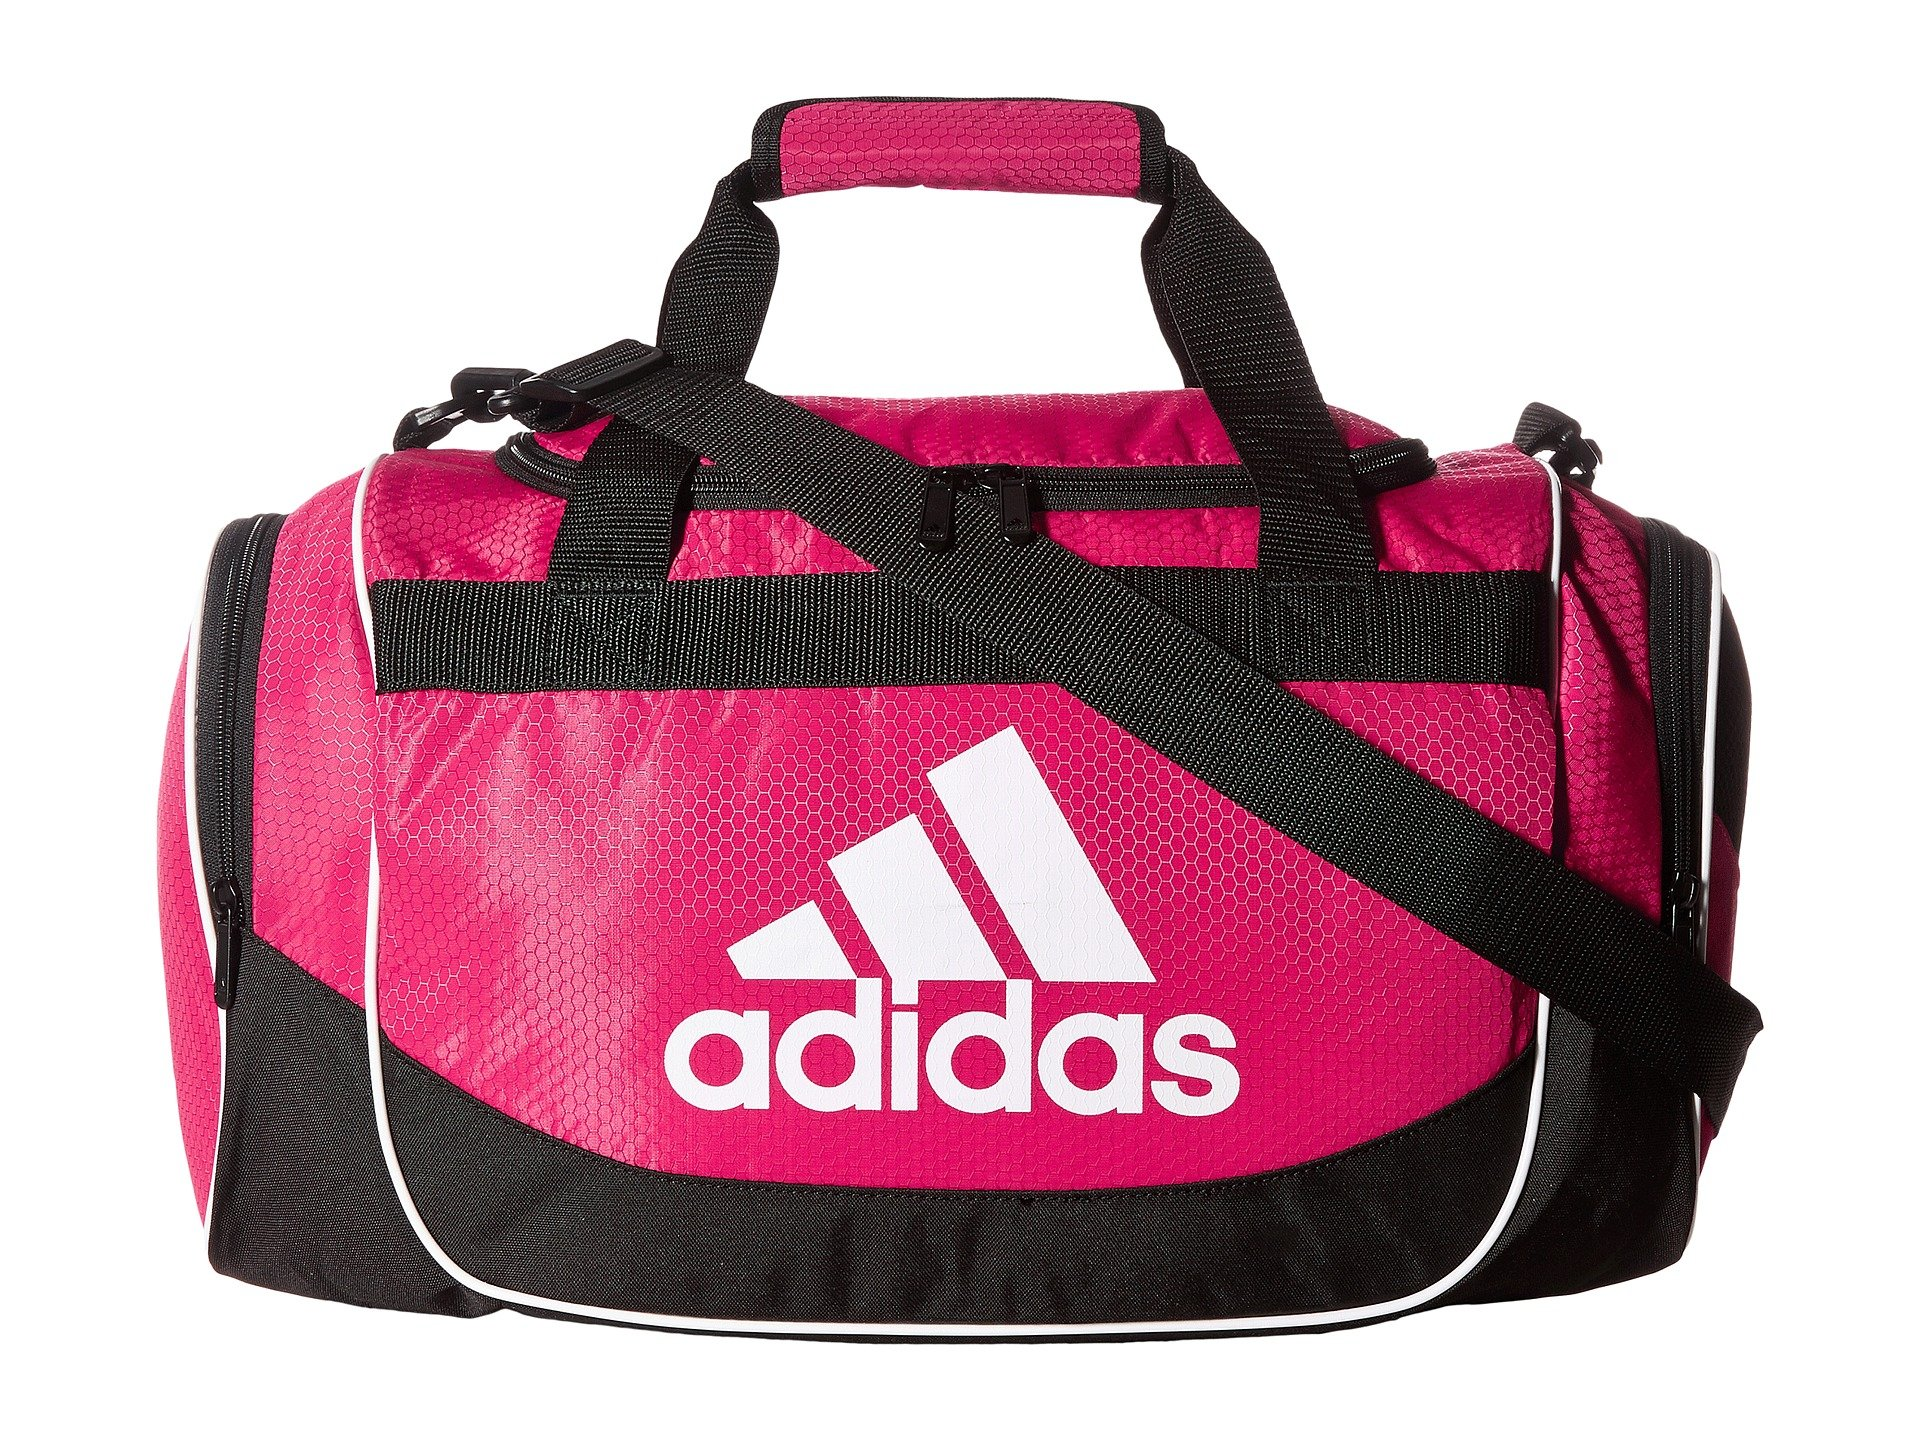 adidas Unisex Defense Small Duffel Bold Pink One Size